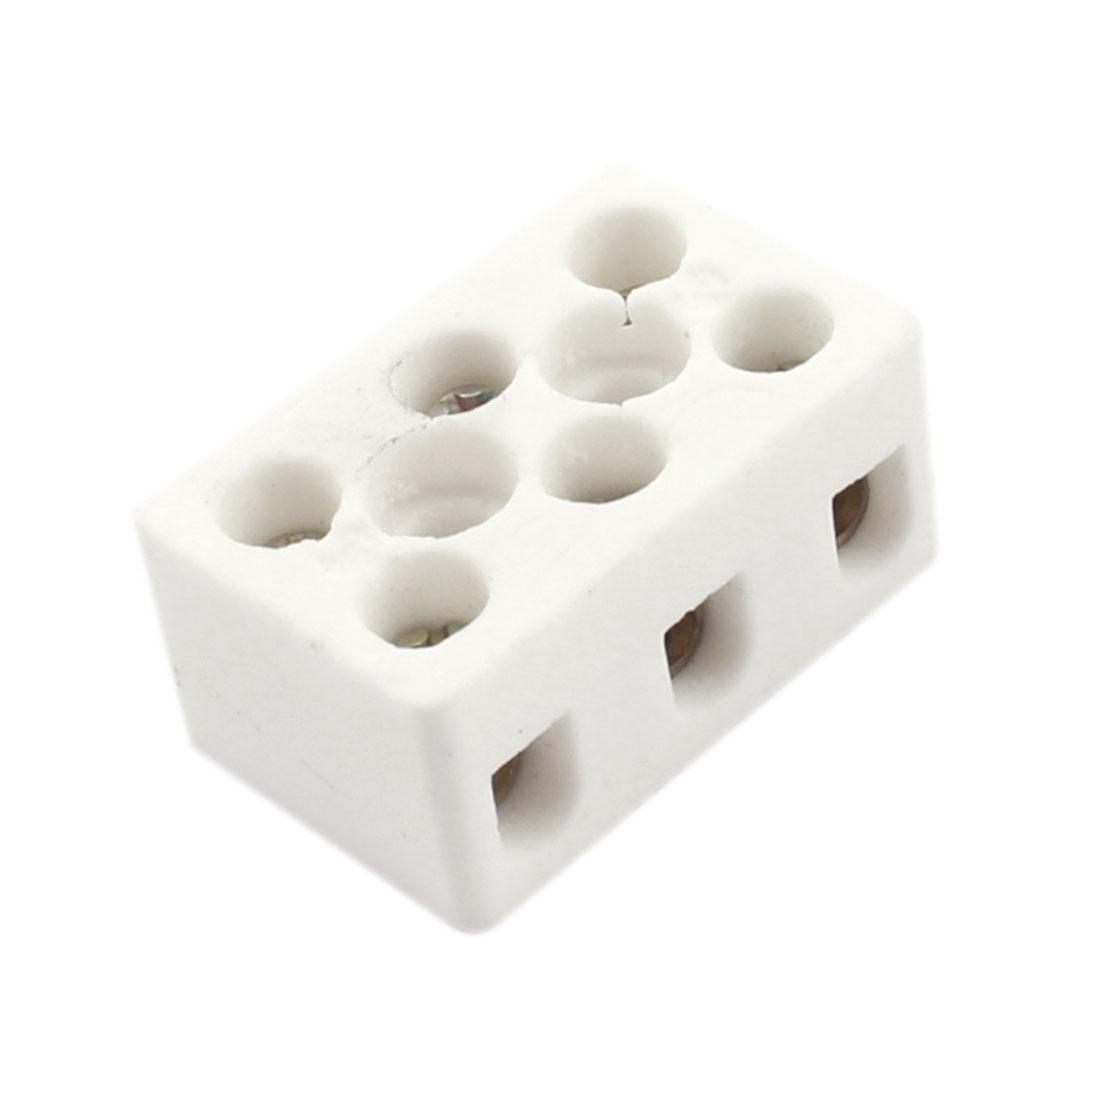 Connector Porcelain Ceramic Terminal Block 3 Way 8 Hole AC 250V 600C